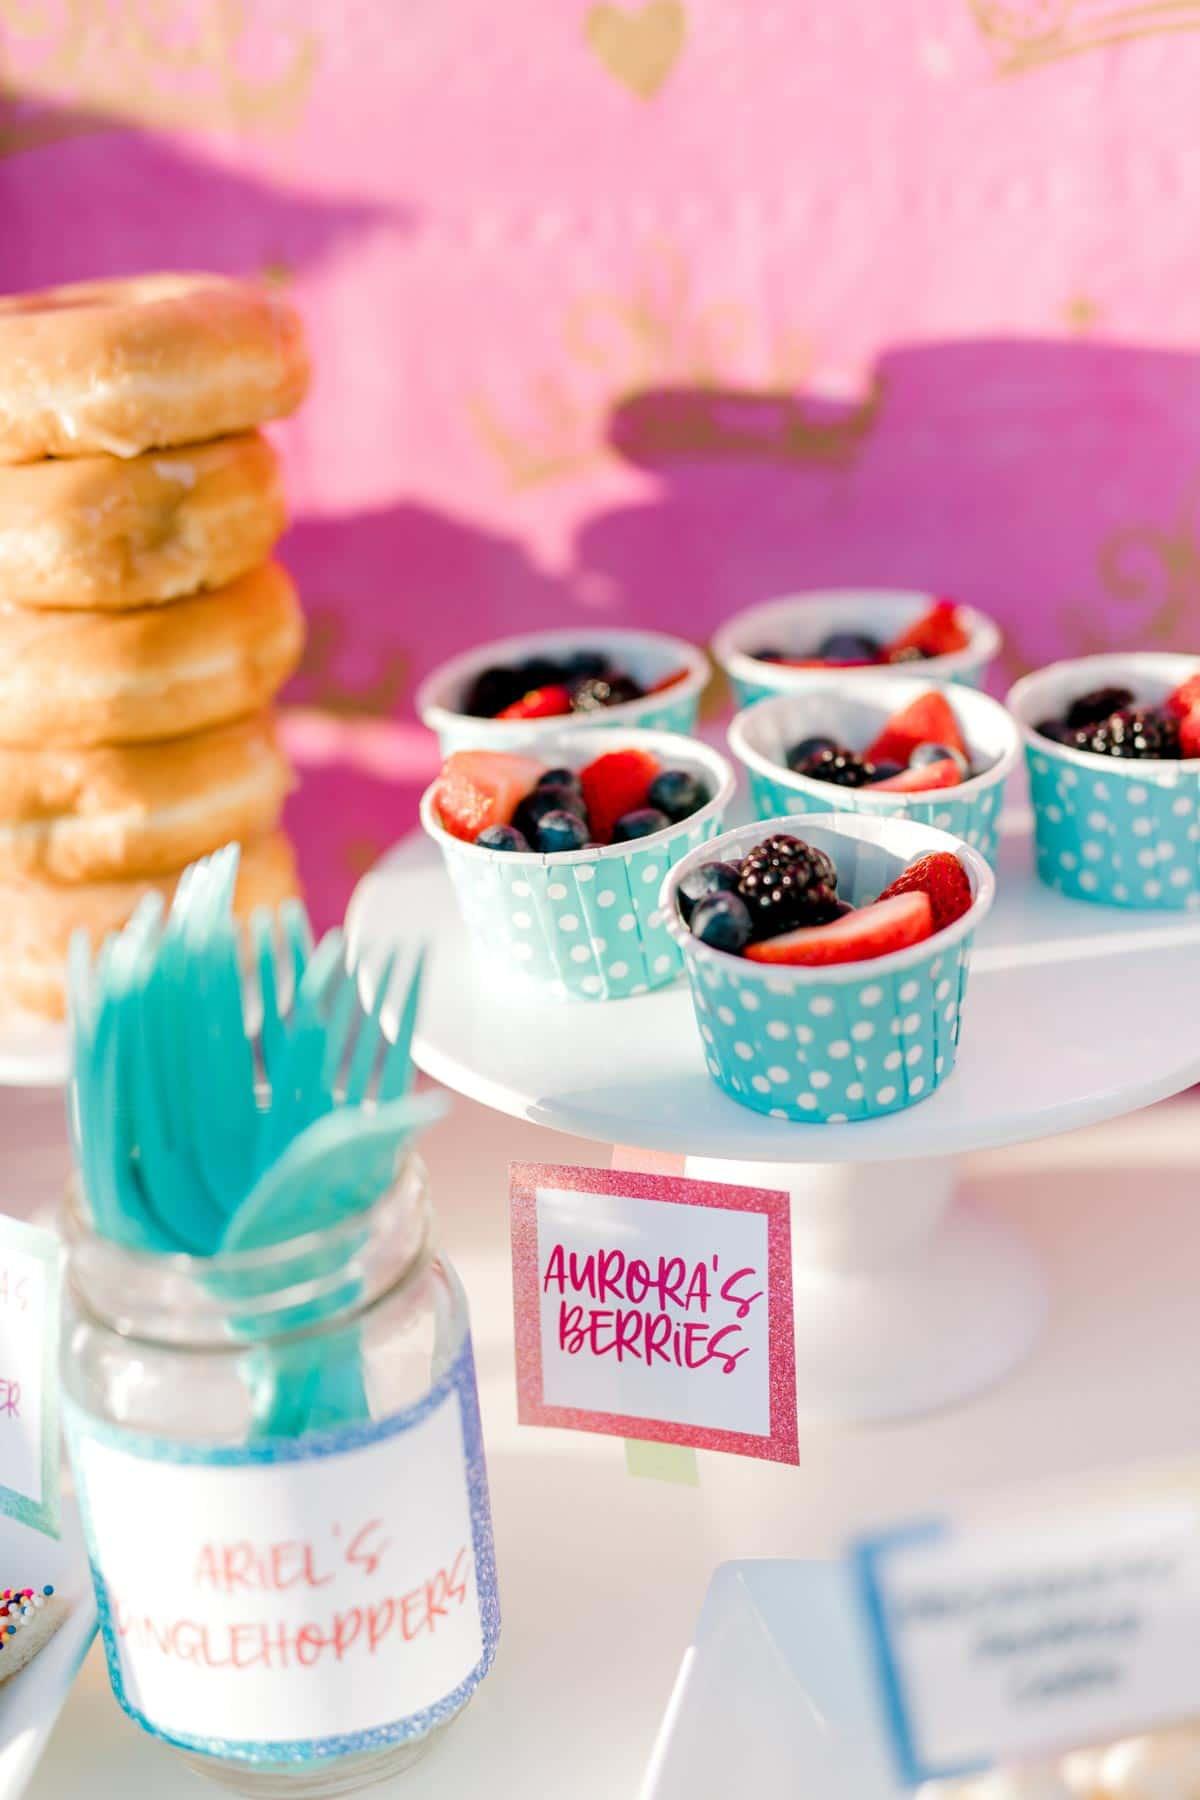 cups of berries